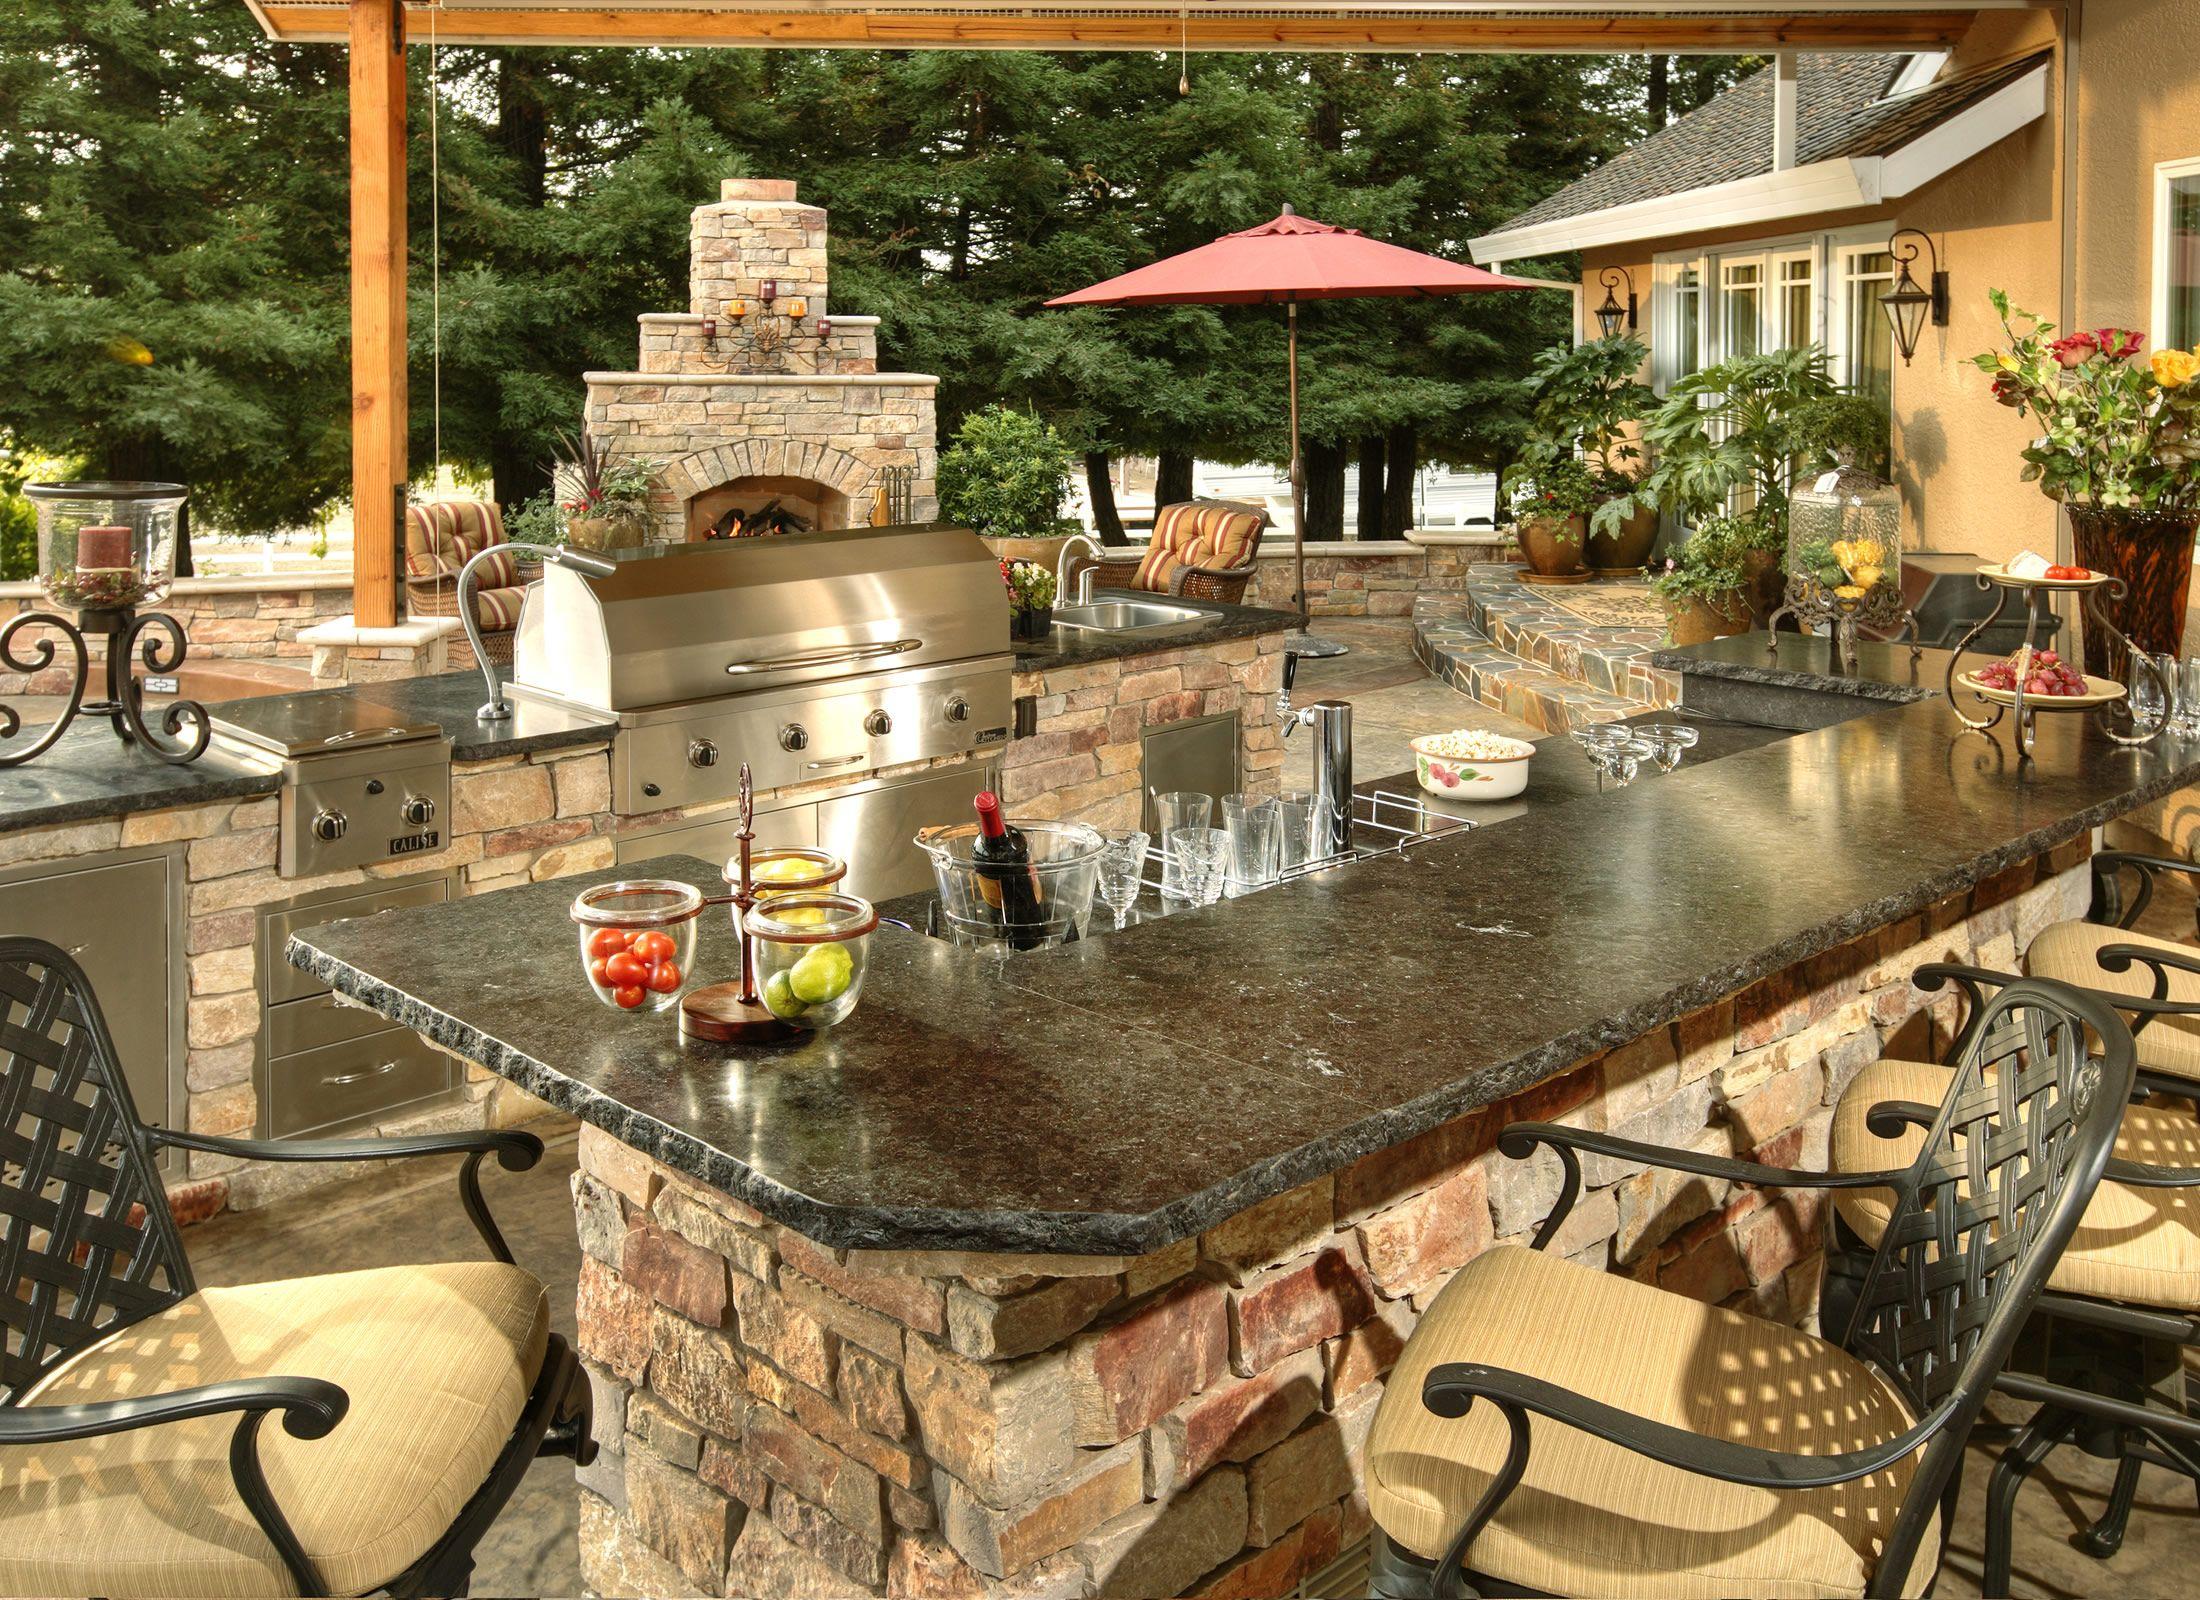 Outdoor Living San Antonio Backyard Products New Braunfels Landscape Design Corpus Christ Outdoor Kitchen Outdoor Kitchen Countertops Outdoor Kitchen Plans